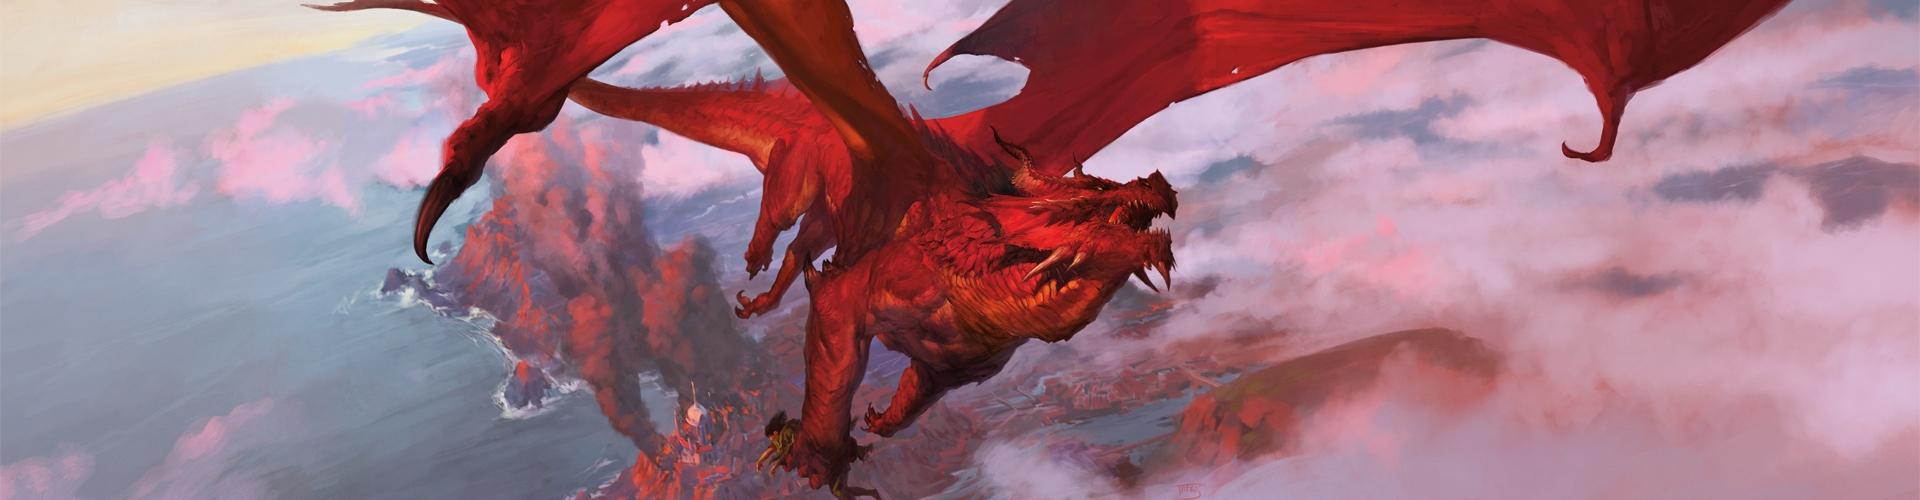 Tyranny of Dragons: Online Comic #5